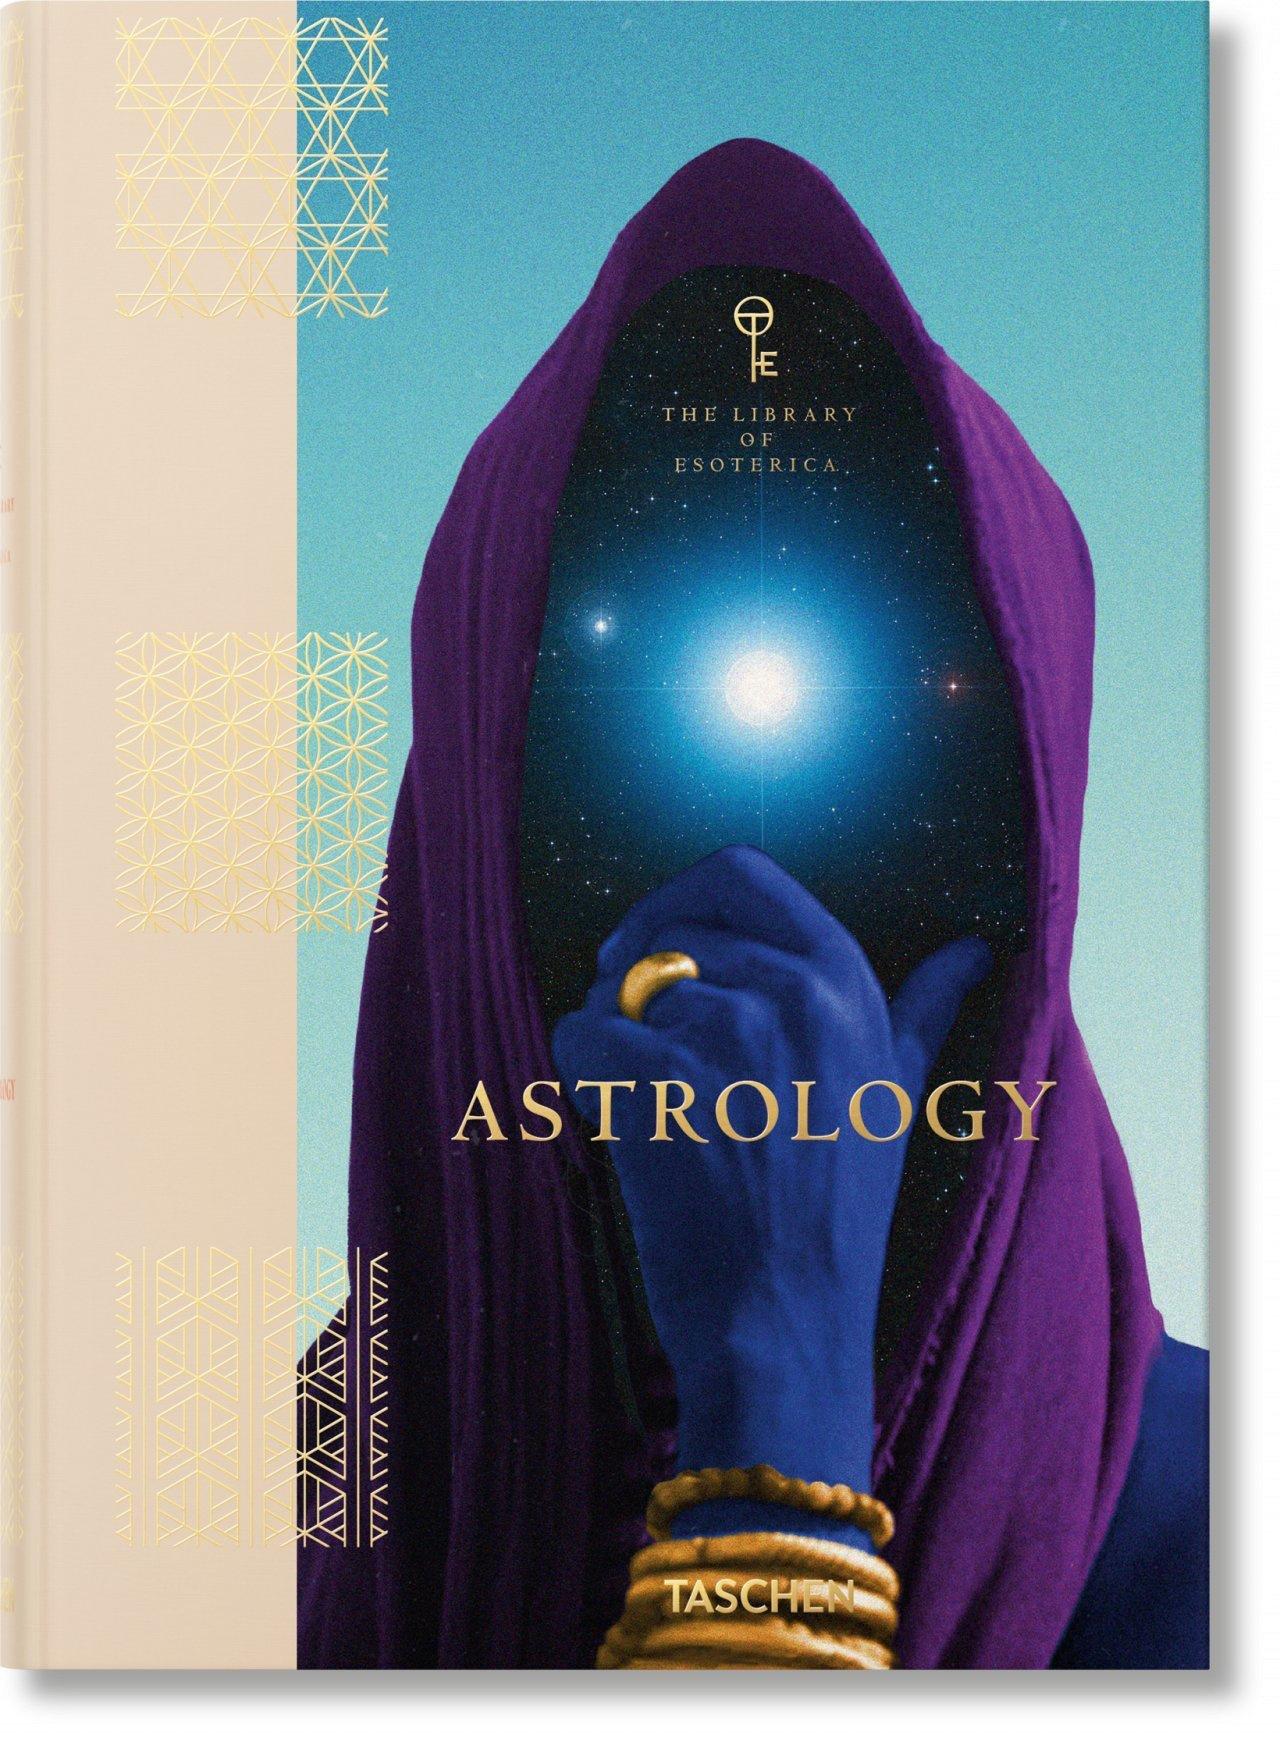 ASTROLOGIE. LA BIBLIOTHEQUE DE L'ESOTERISME